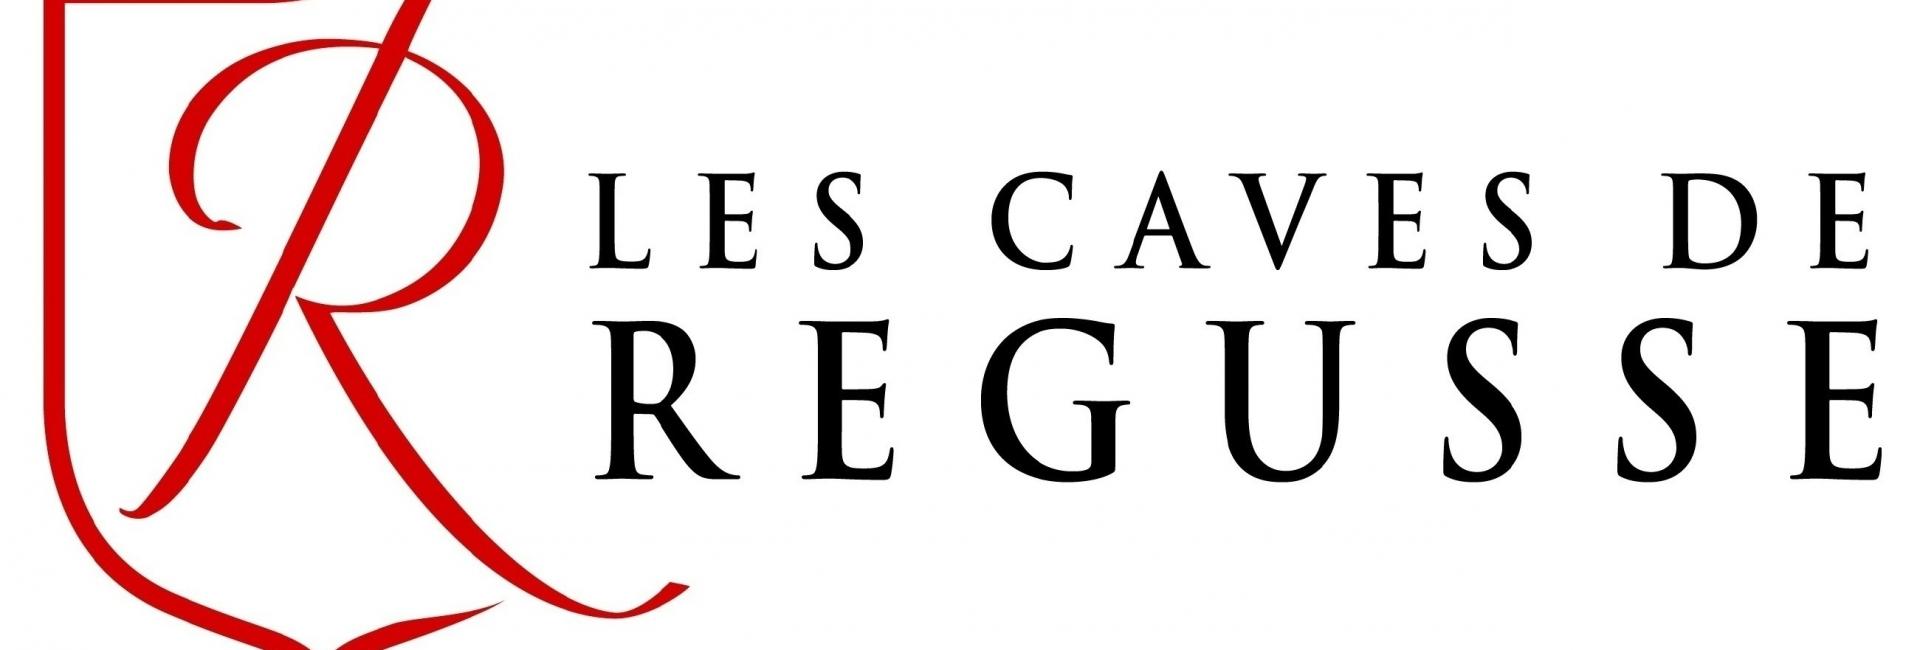 CAVE-DE-REGUSSE-Logo-1920x650_1_1